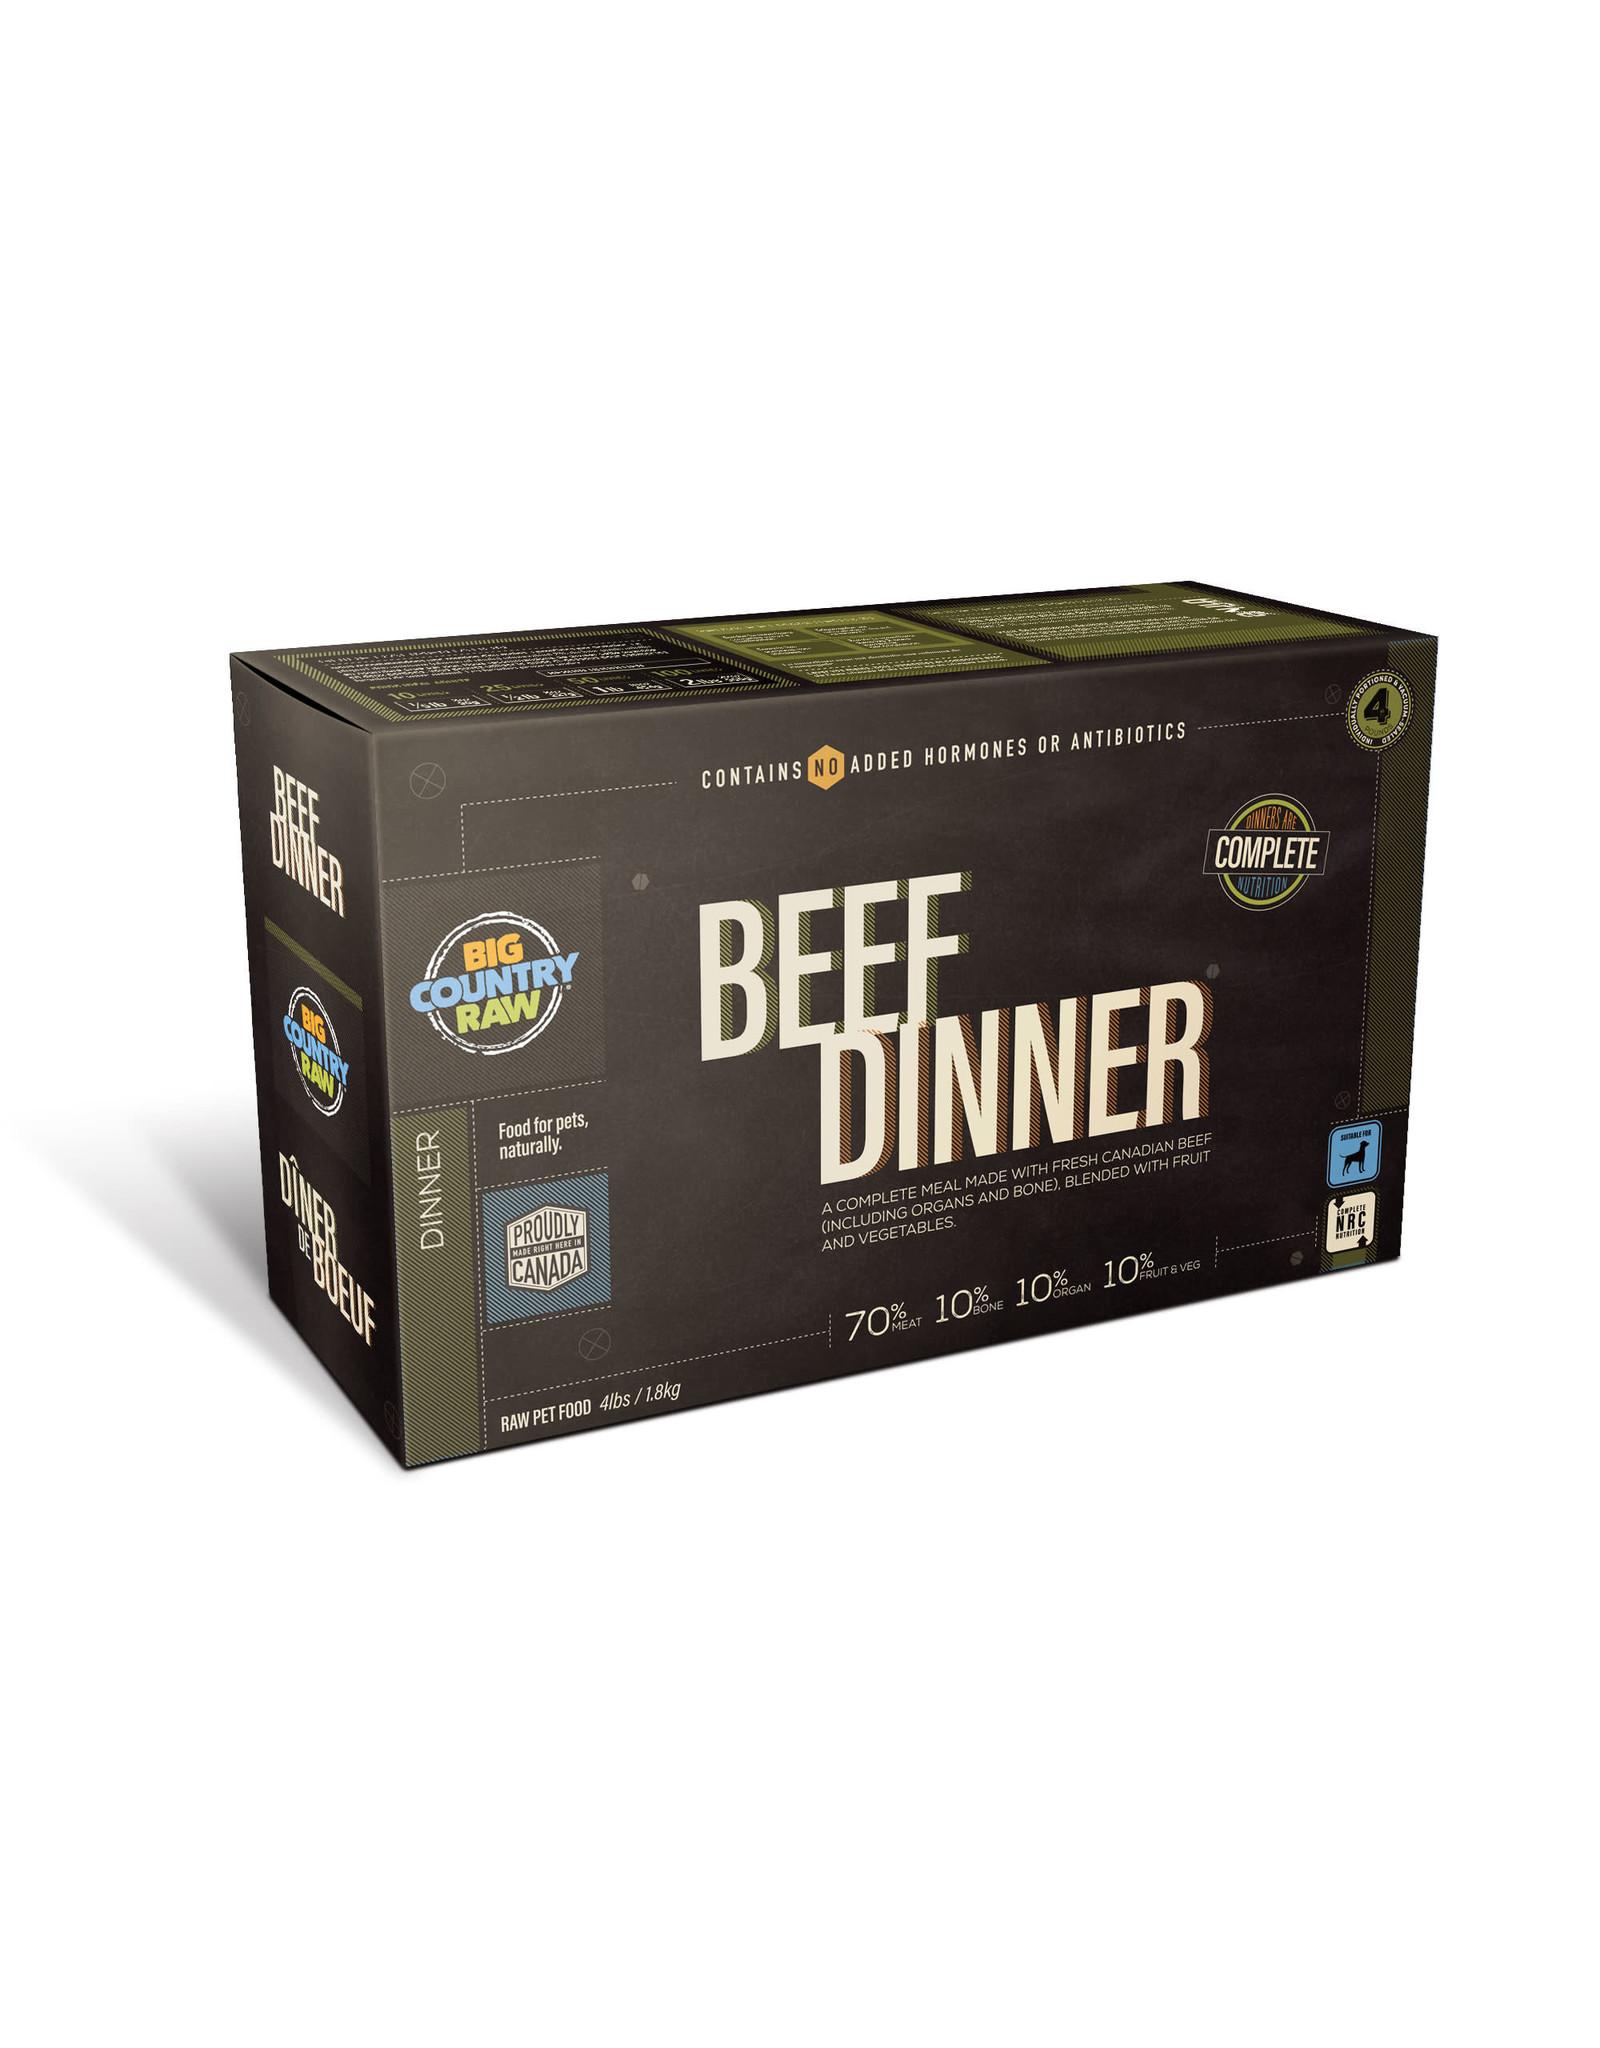 BCR BCR CARTON - 4x1lb - Beef Dinner